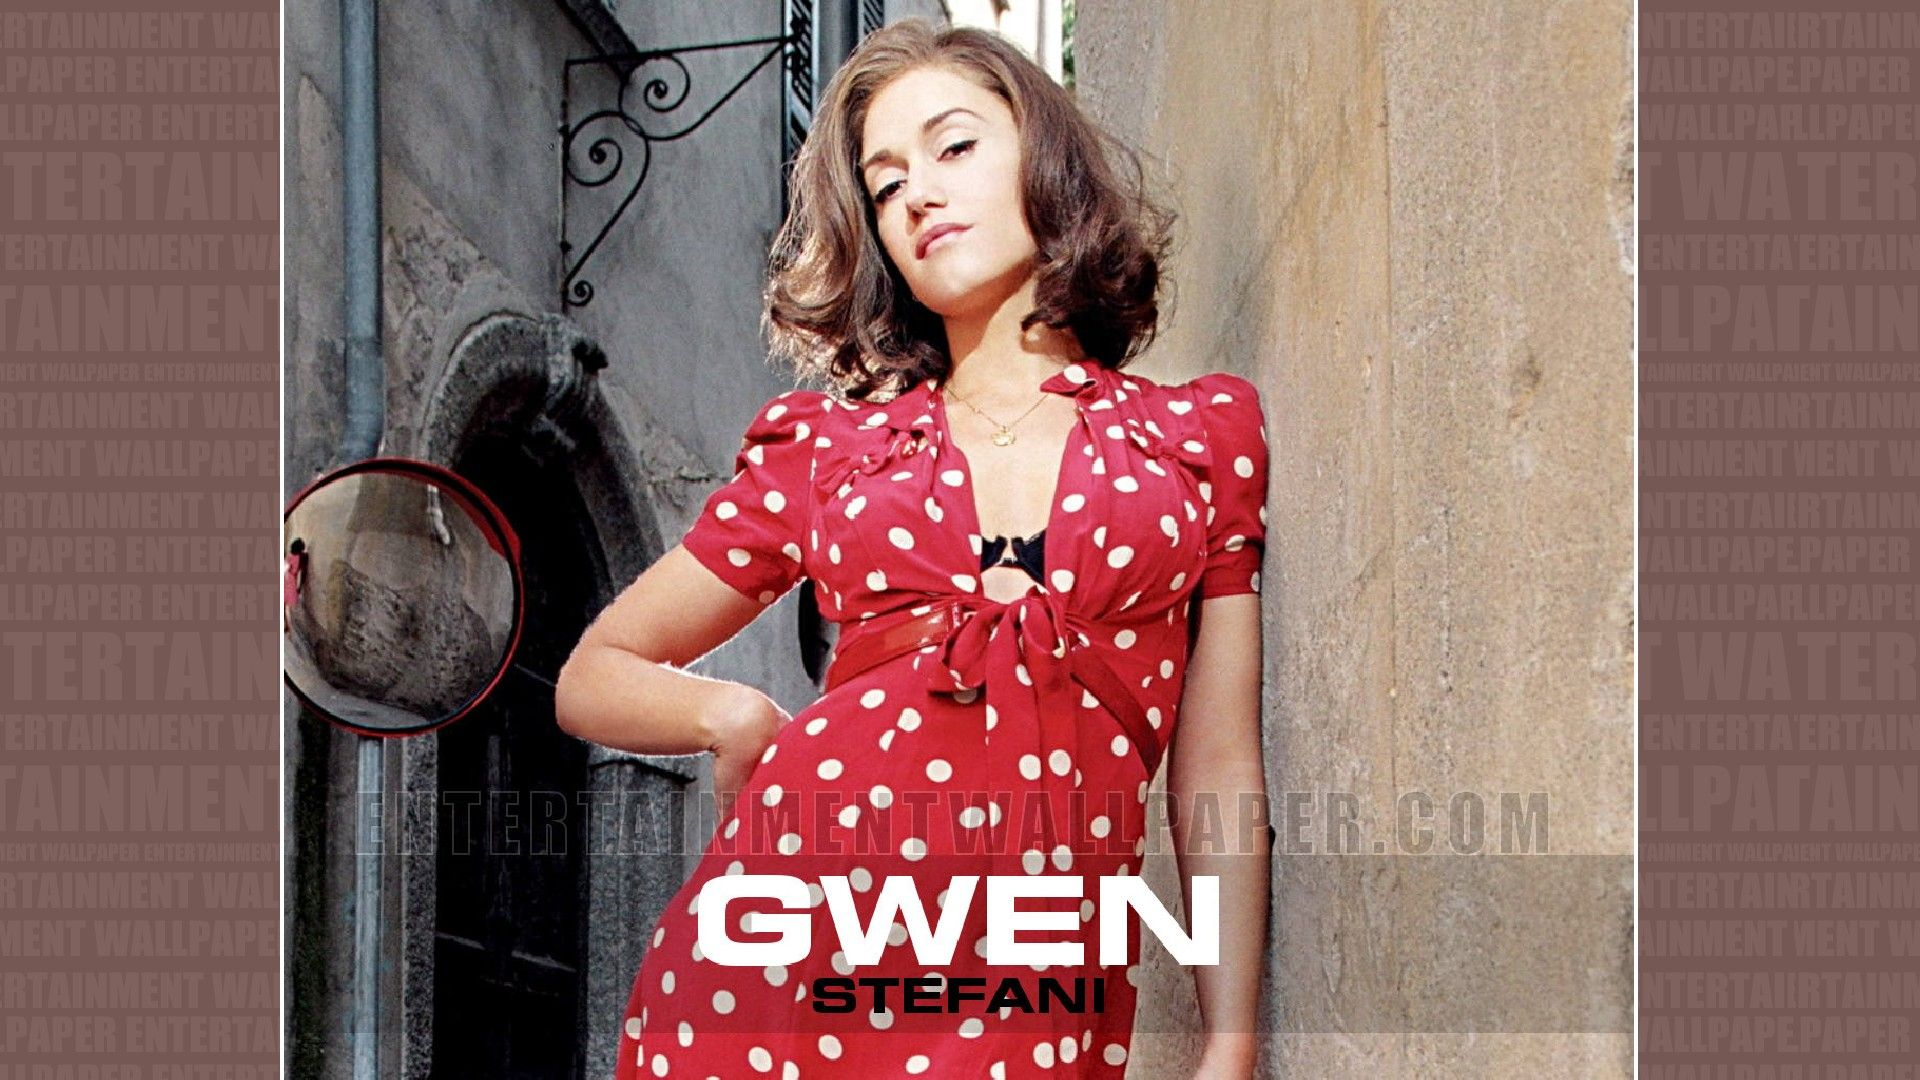 Gwen Stefani Wallpapers Mobile Compatible Gwen Stefani Wallpapers